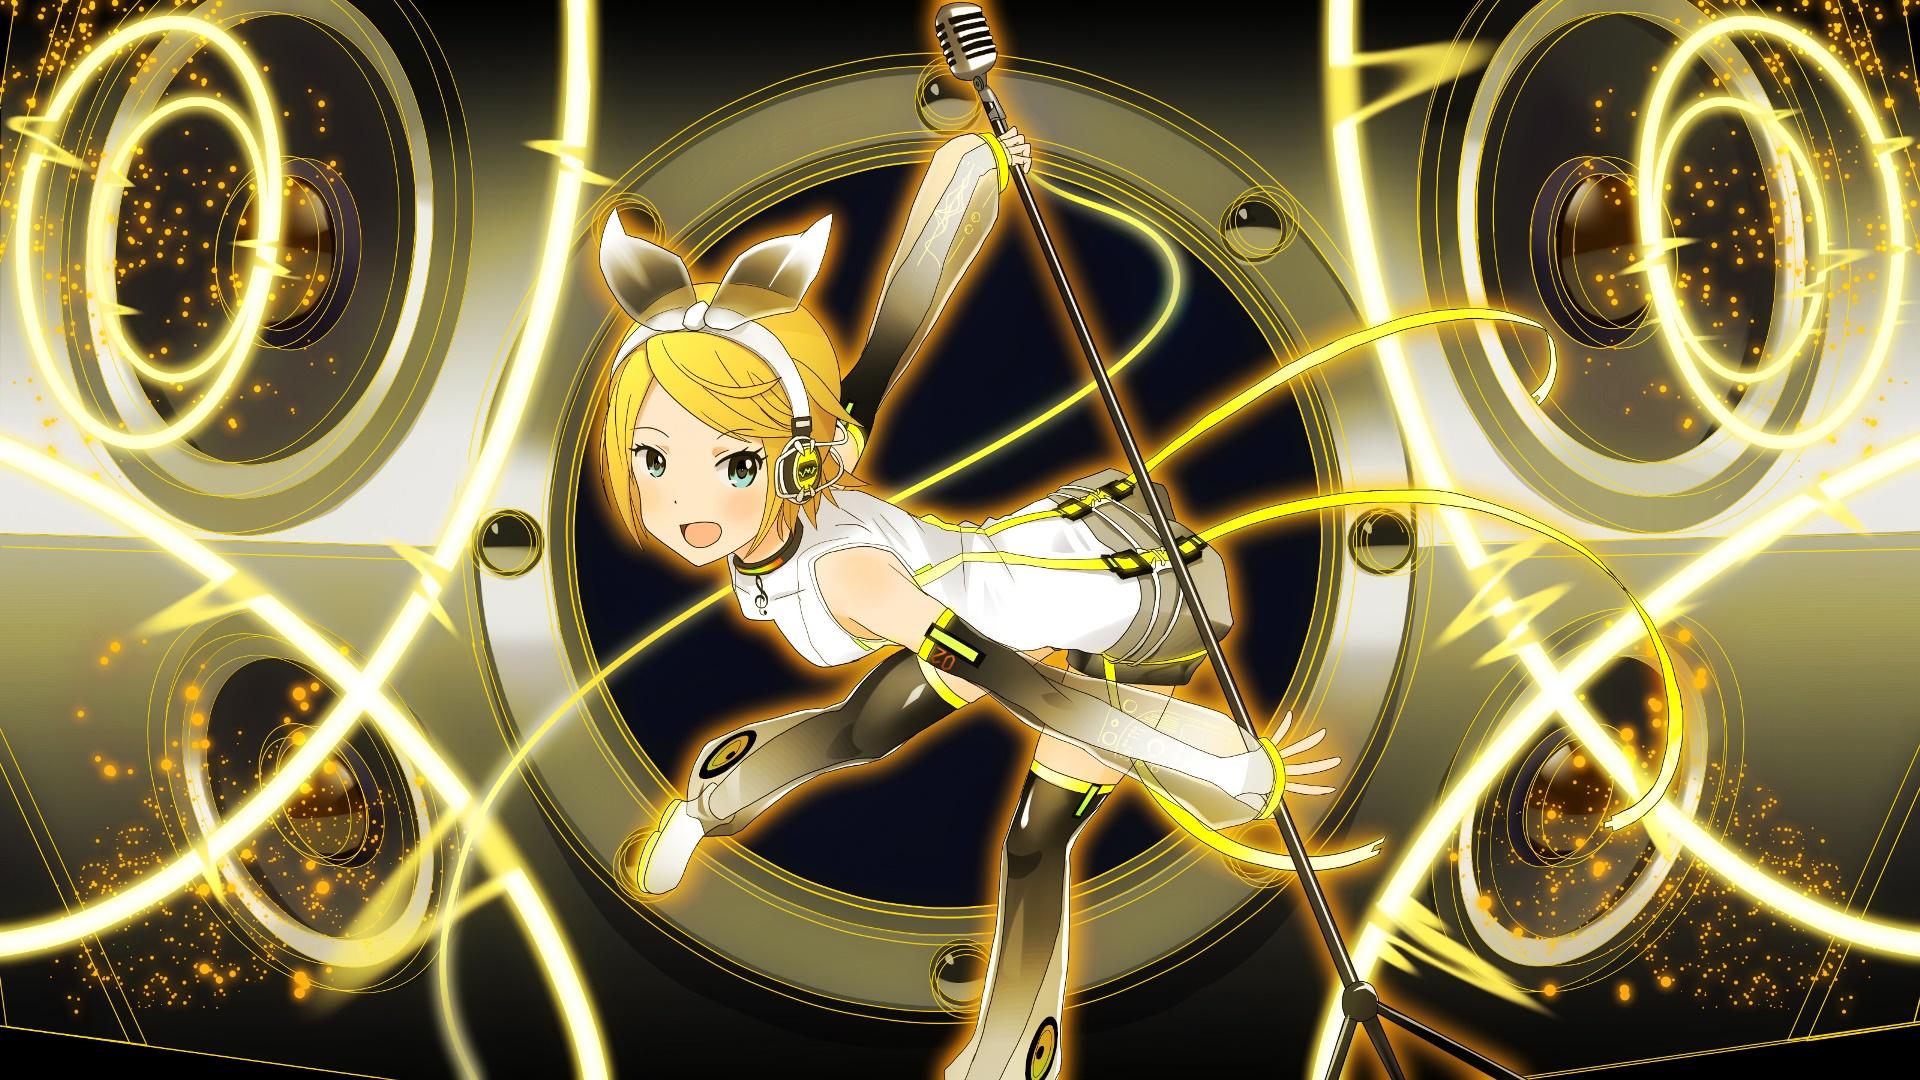 Vocaloid Wallpaper Rin Vocaloid Kagami...